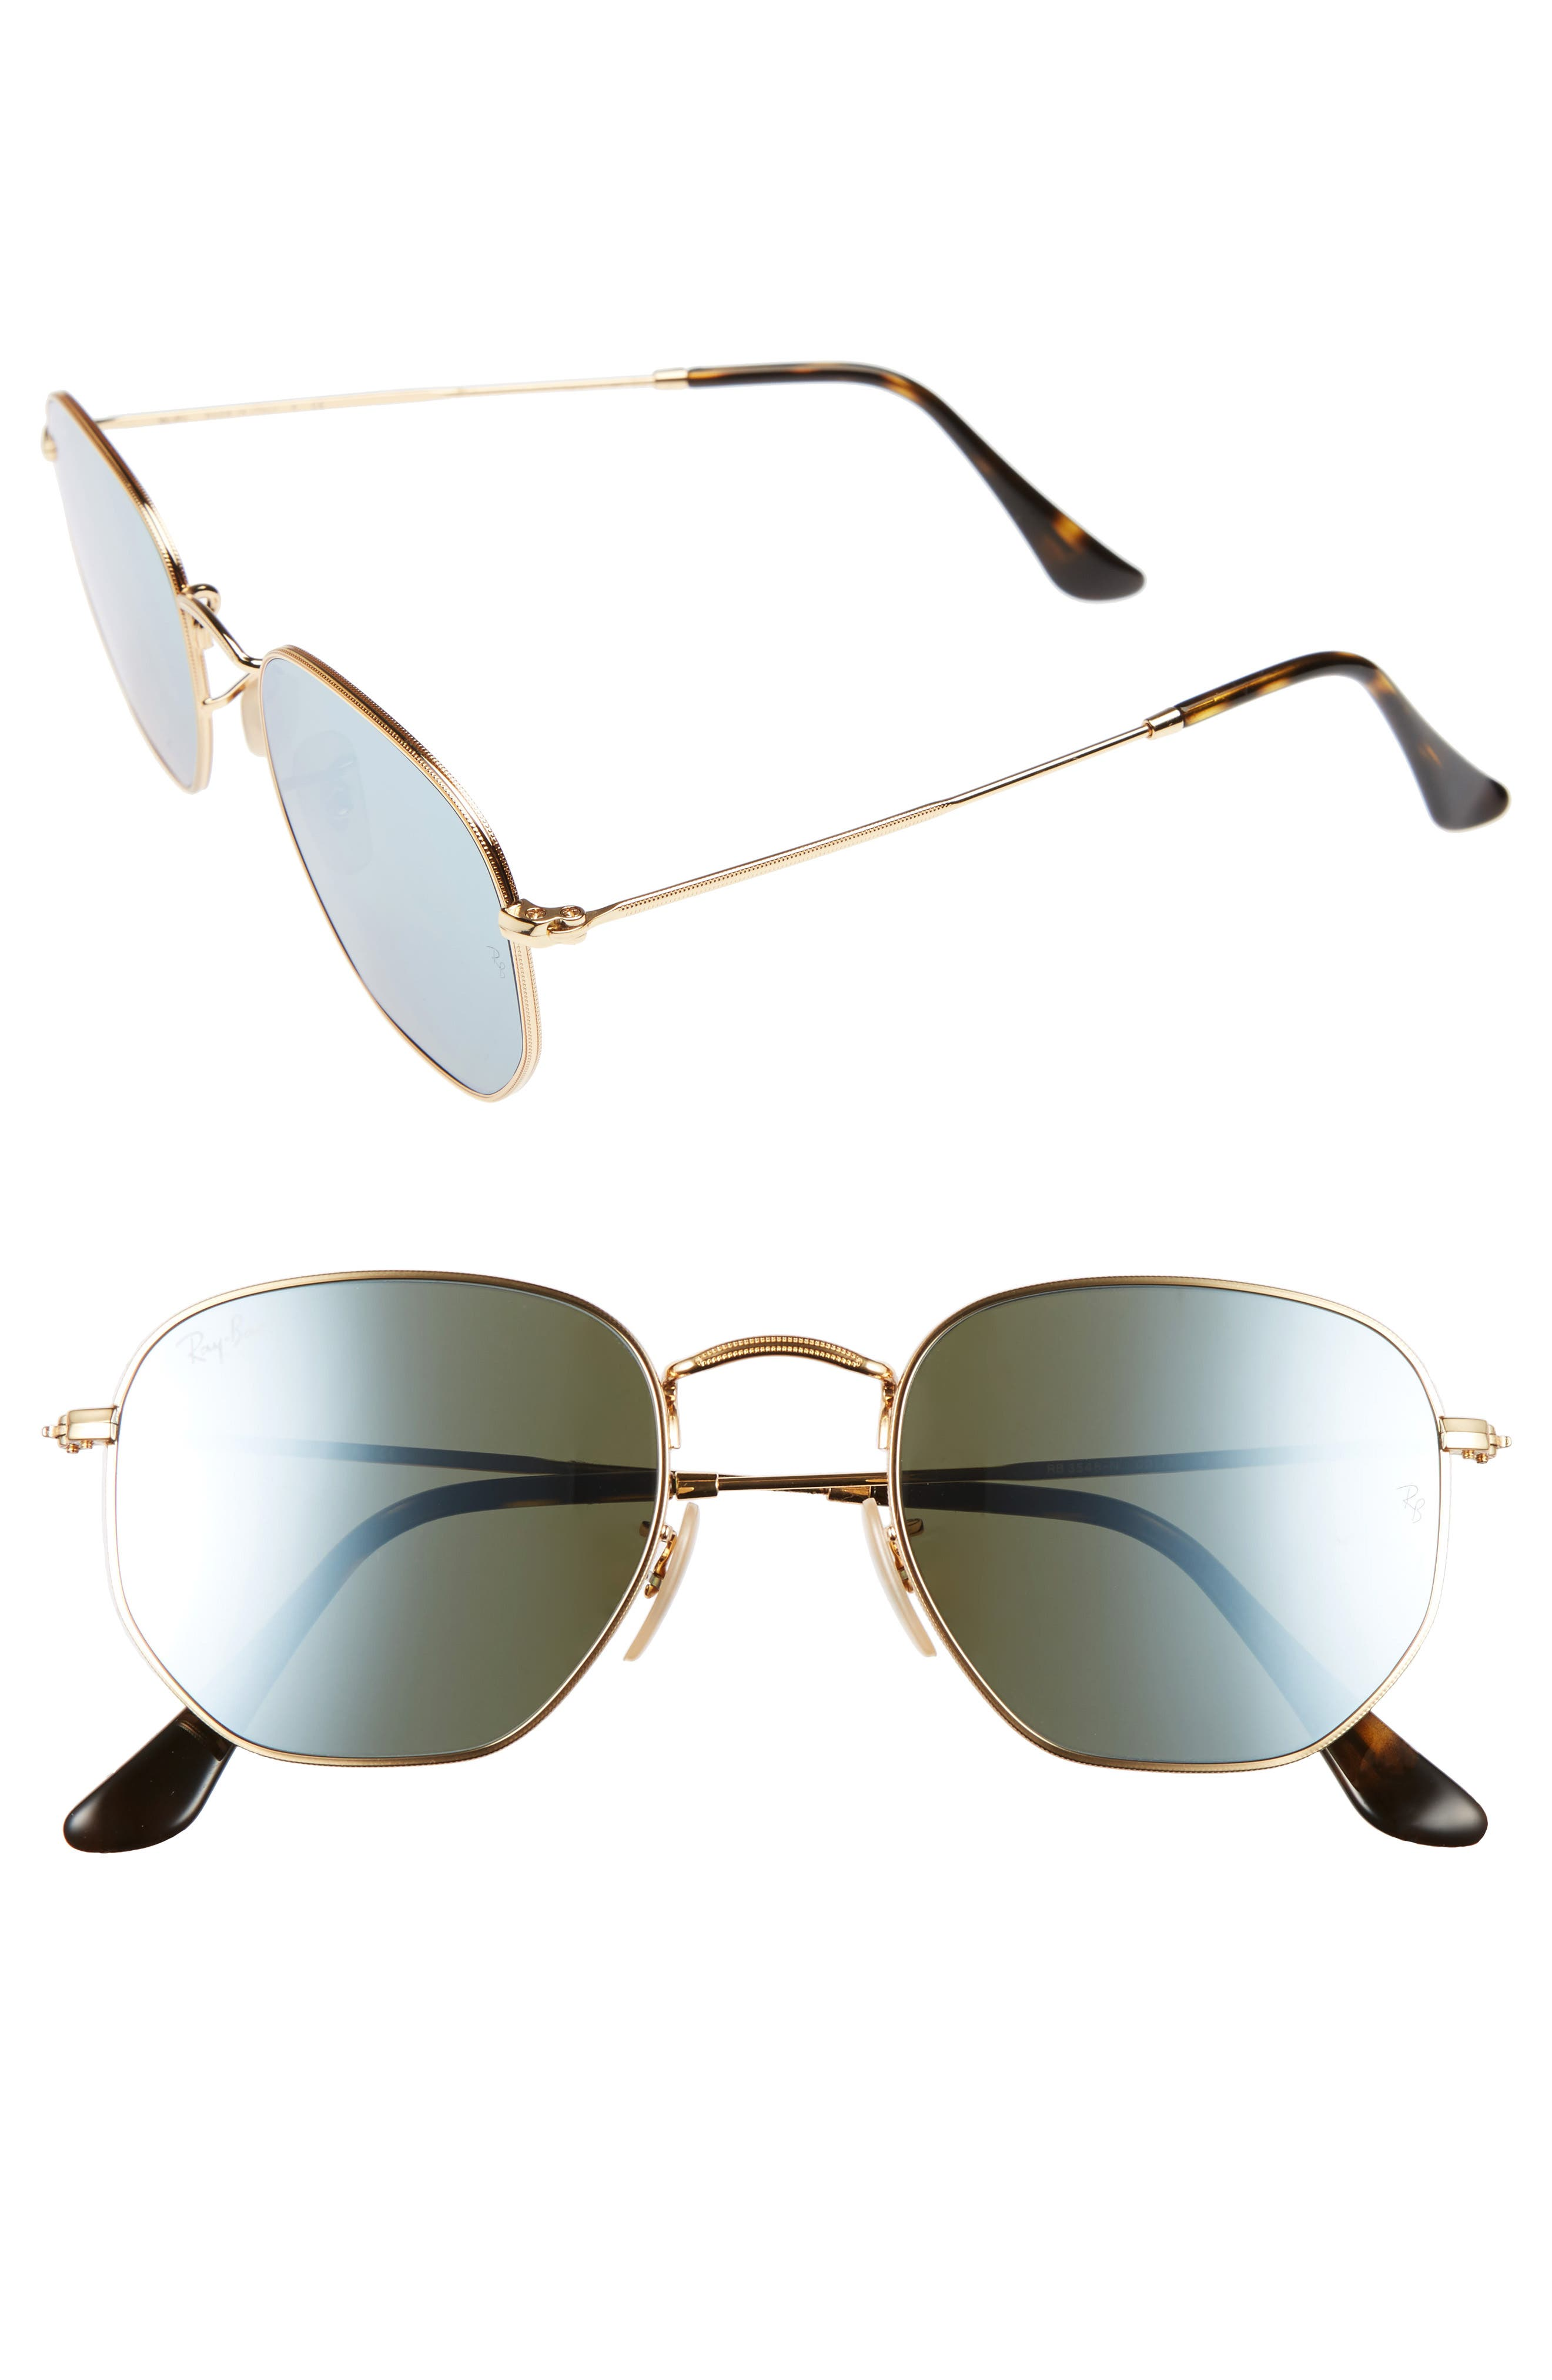 51mm Sunglasses,                             Alternate thumbnail 2, color,                             710